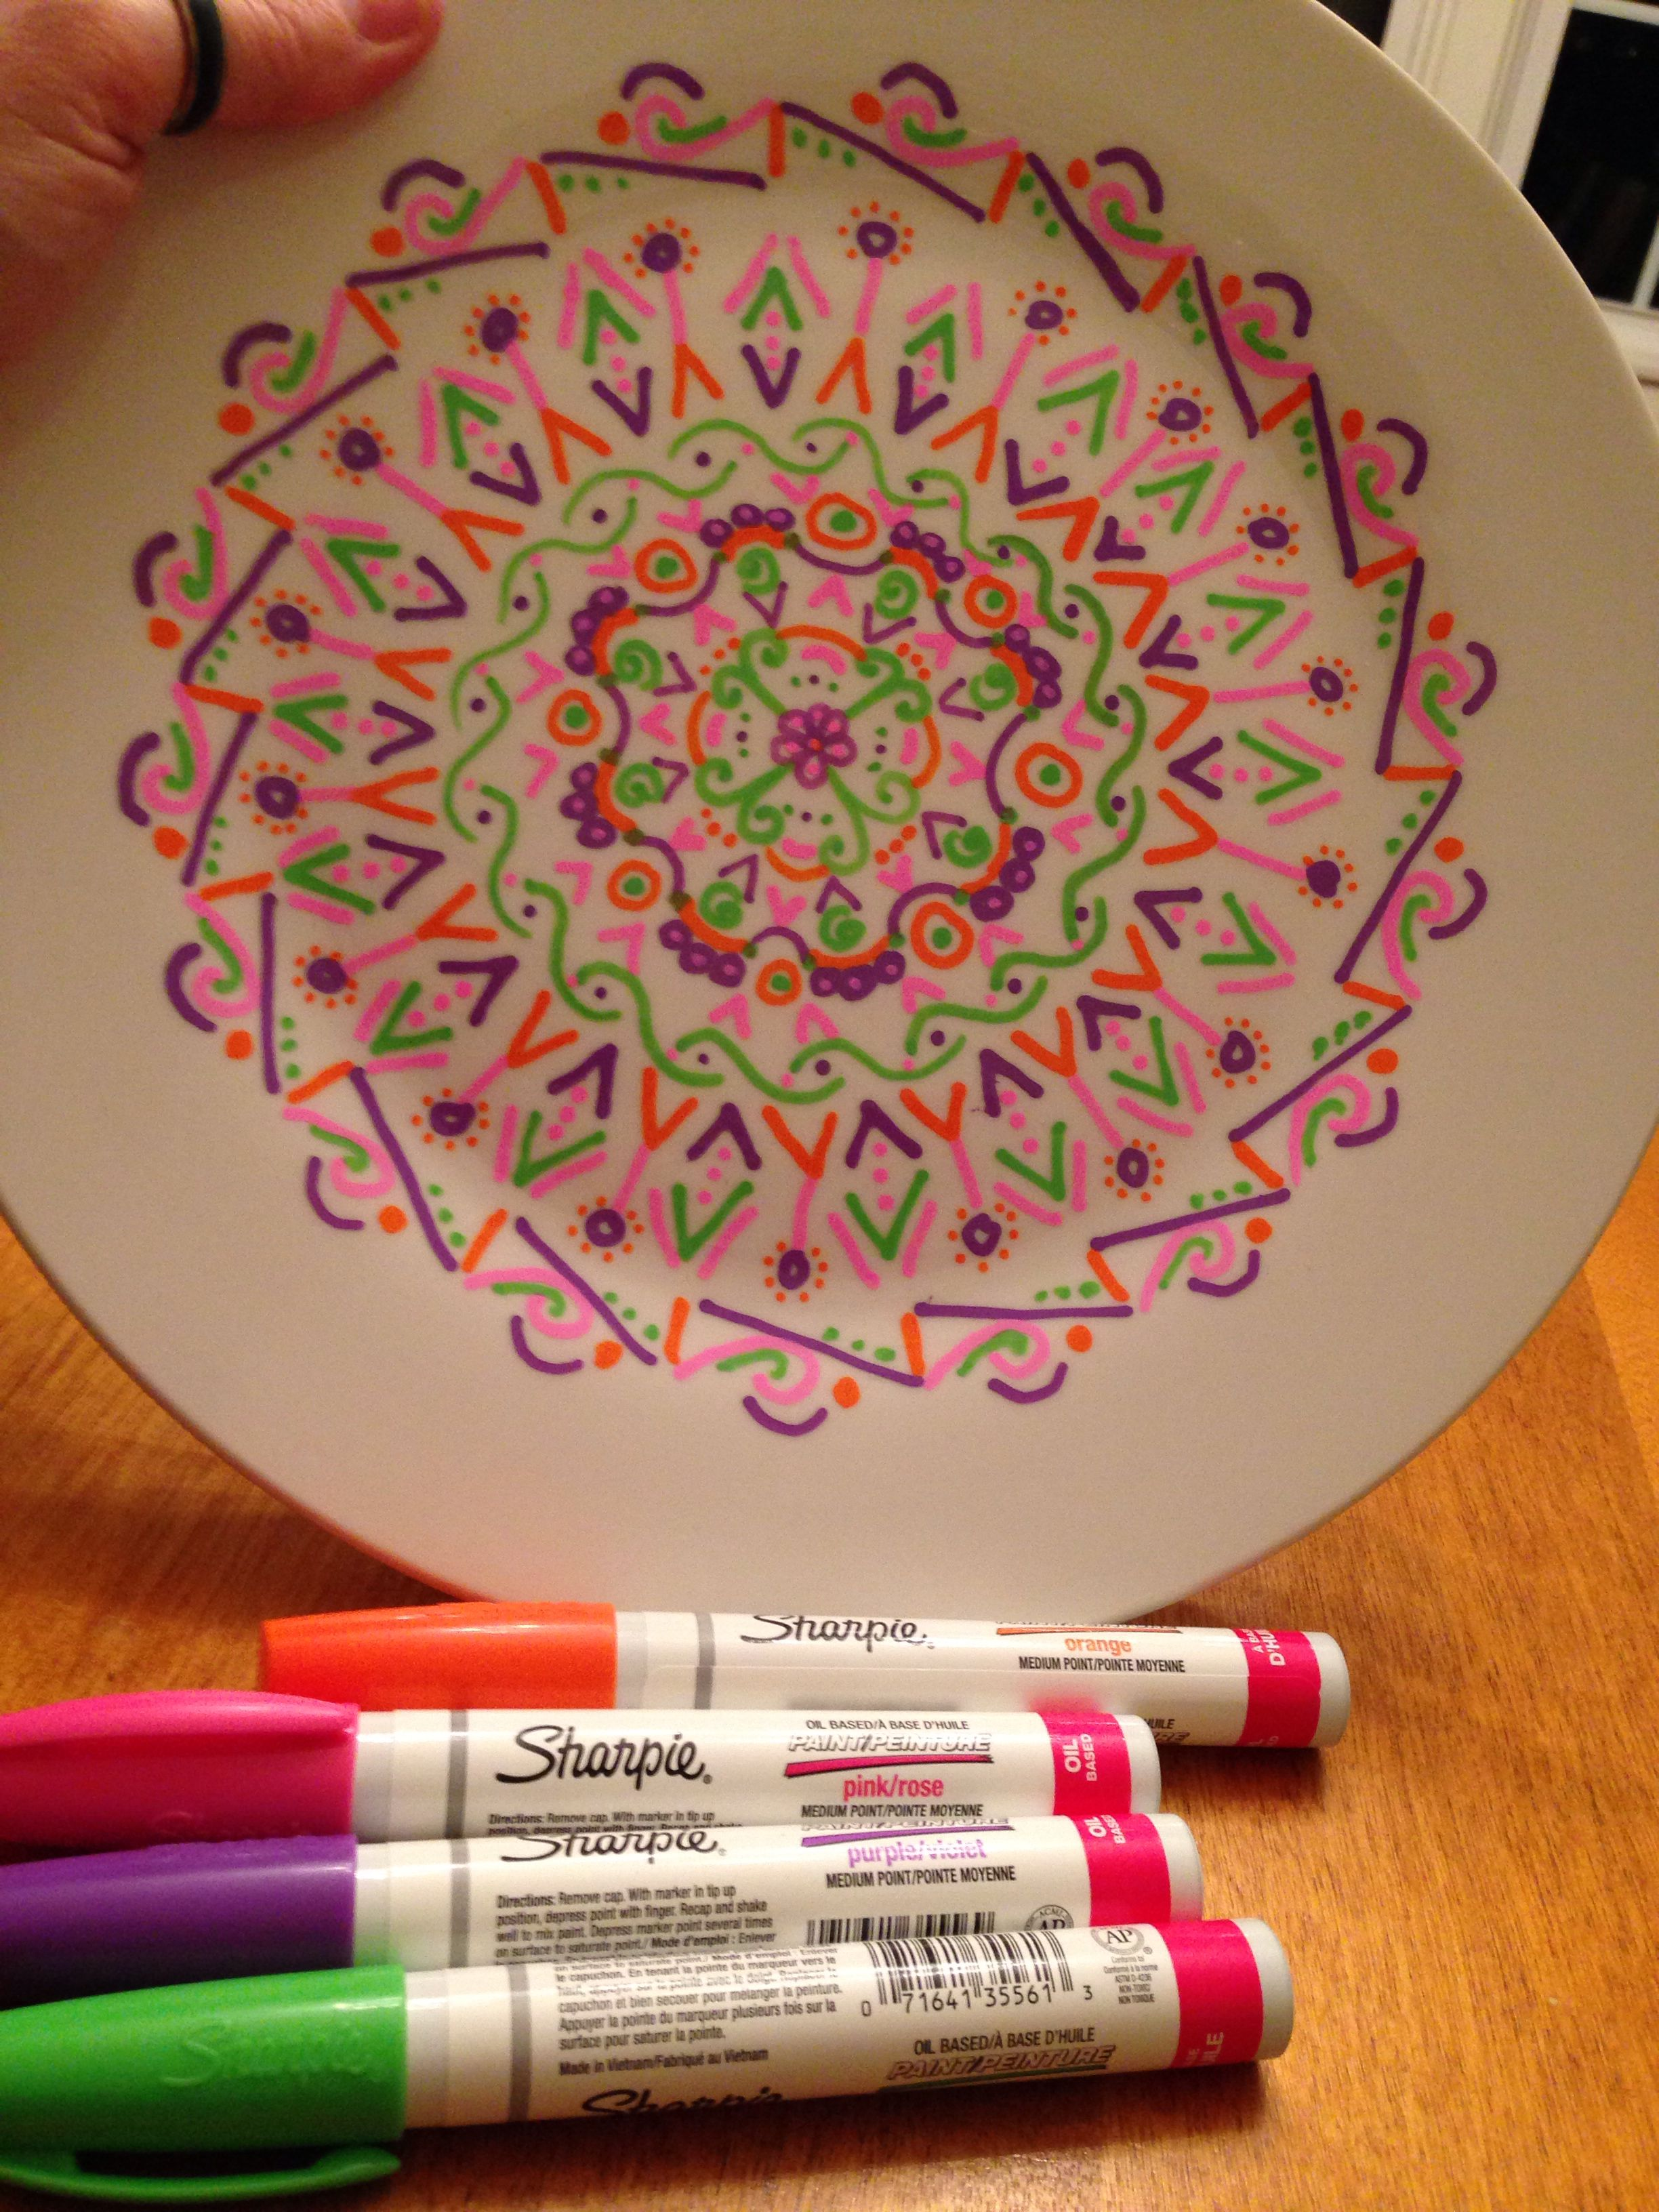 Oil Based Sharpies On Ceramic Plate Sharpie On Ceramic